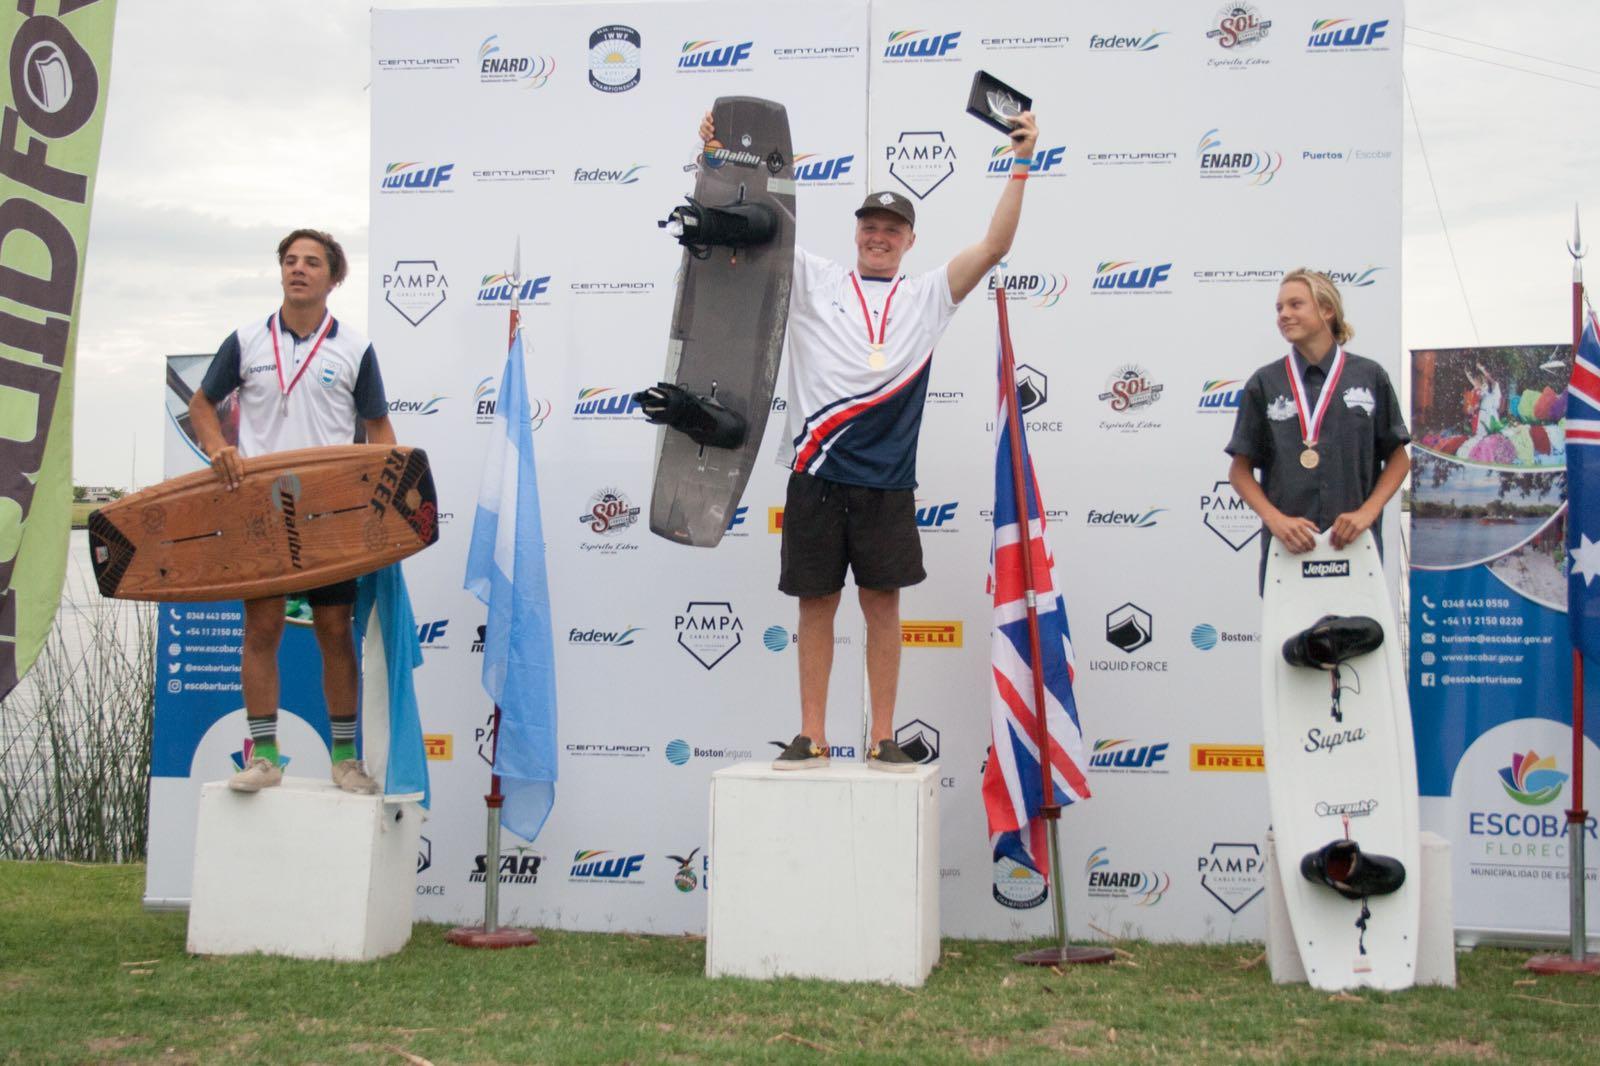 Luca Kidd Wins Gold at IWWF Wakeboard World Championships